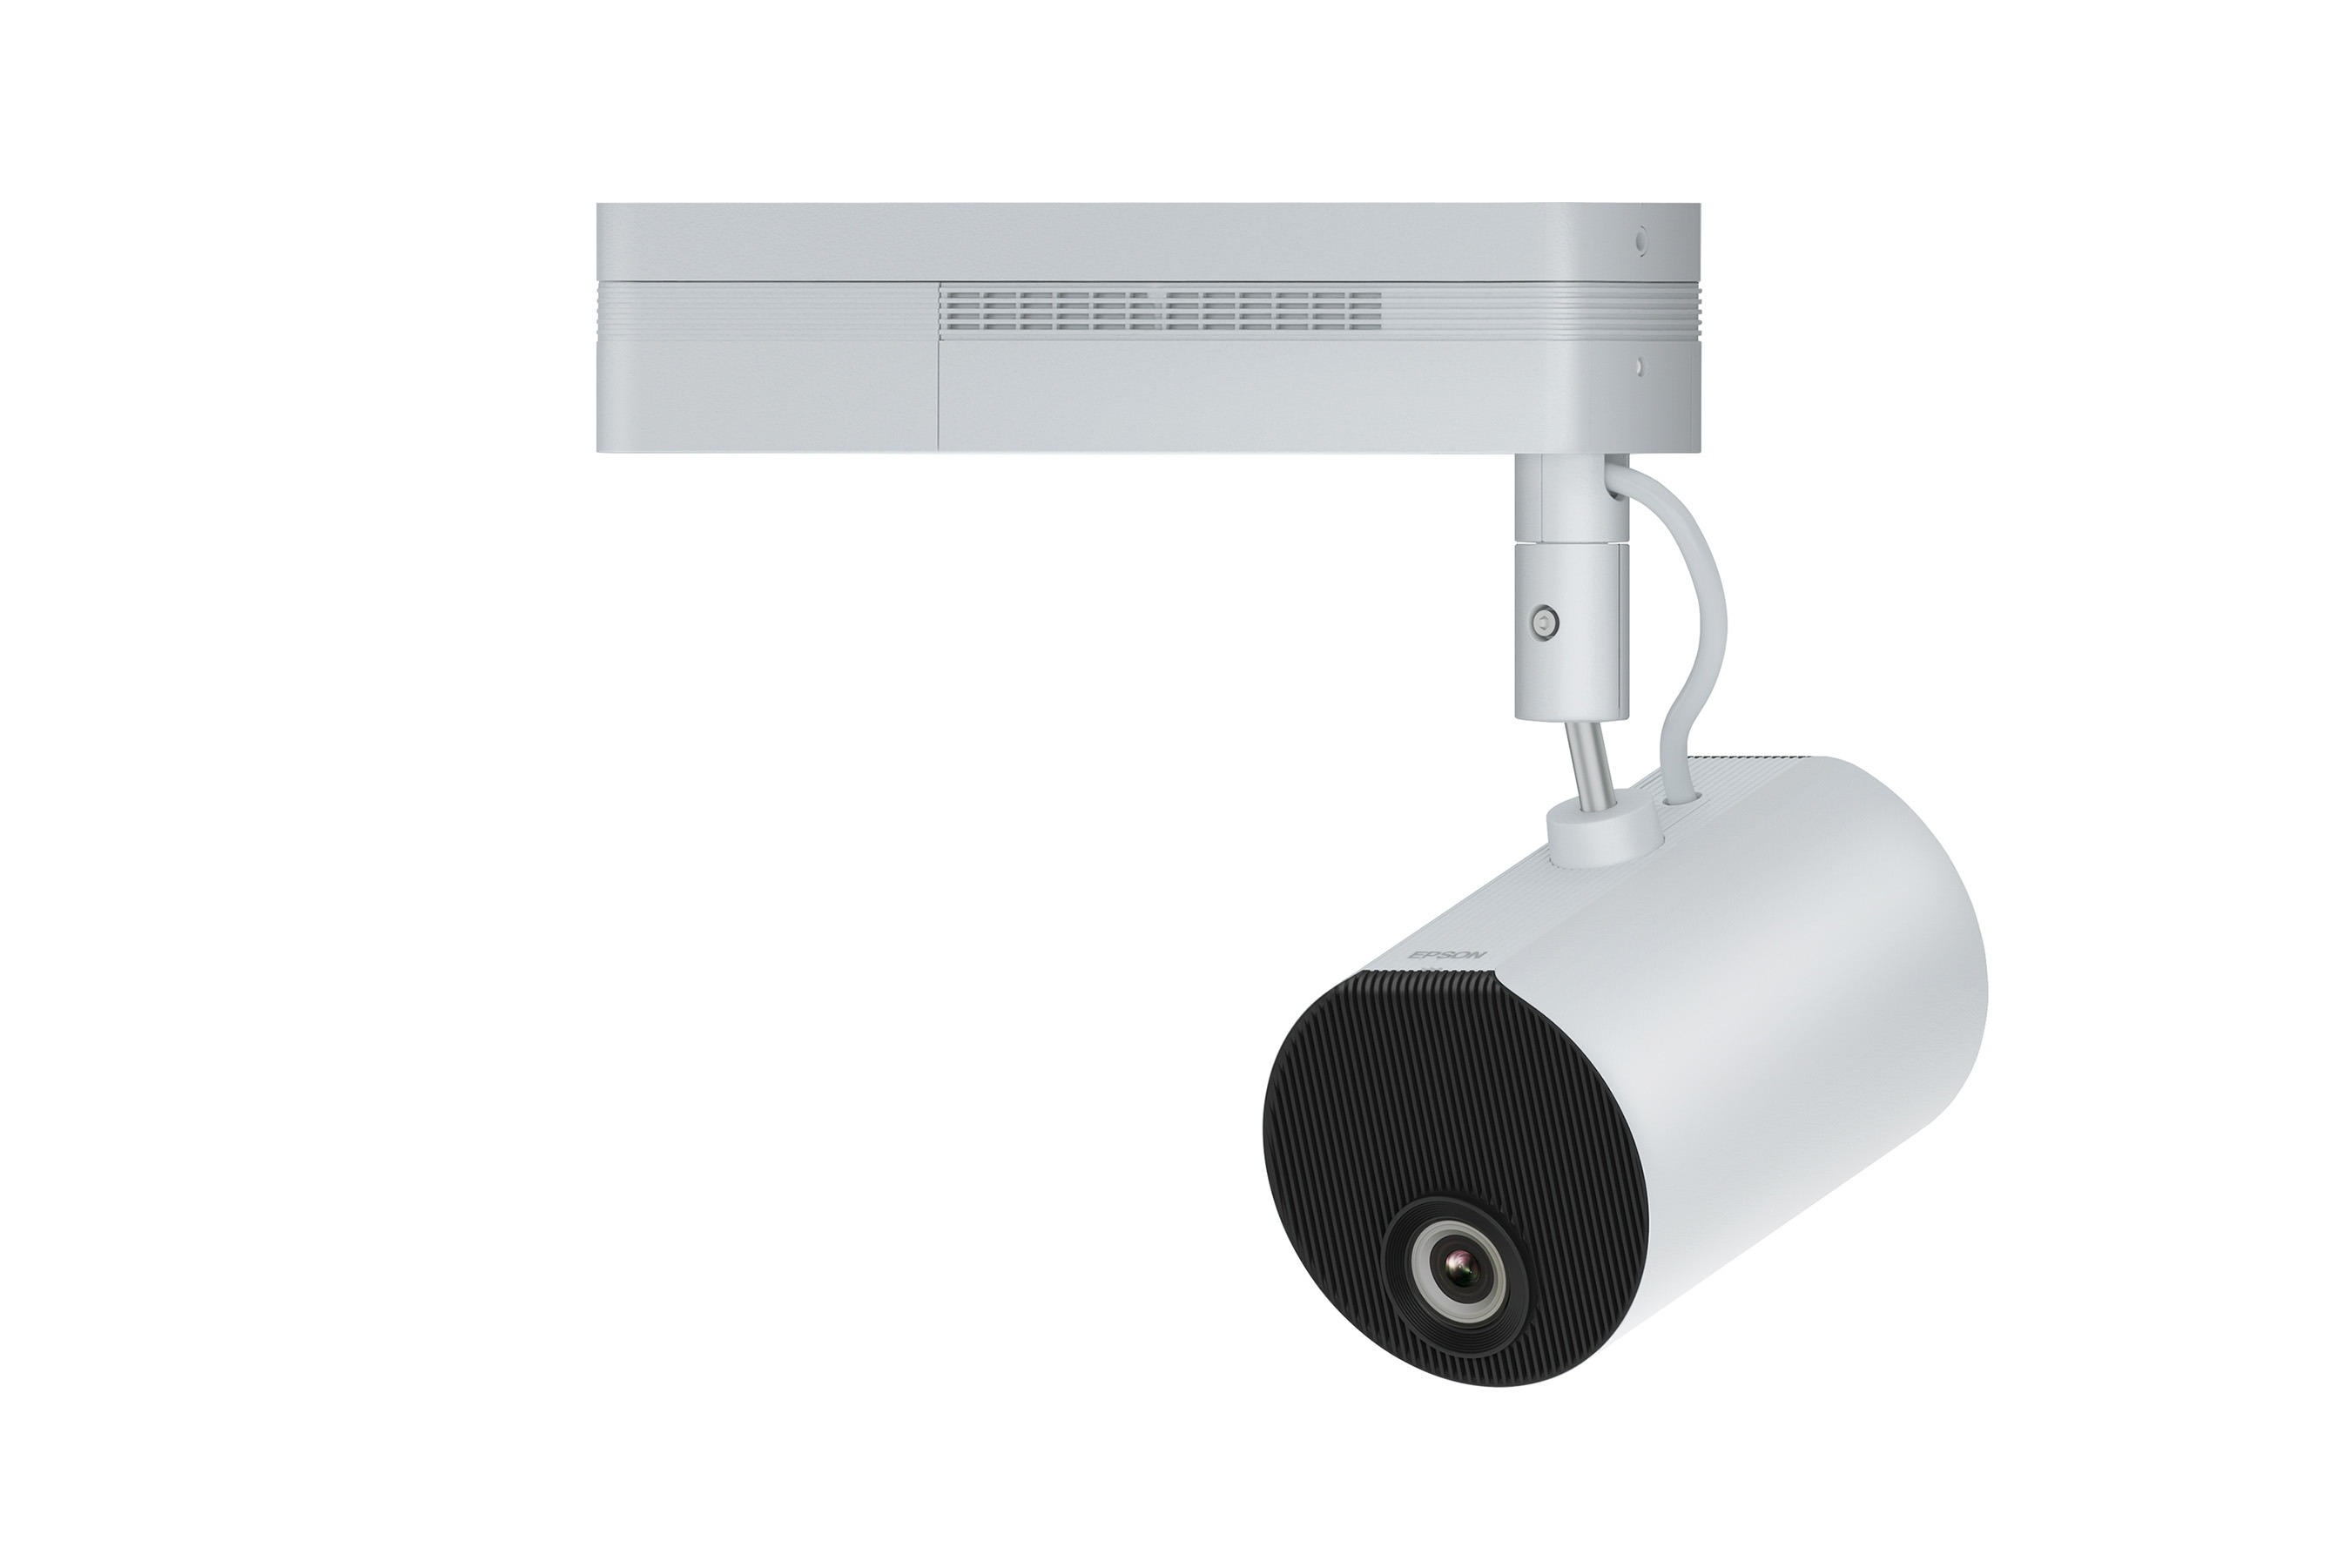 LightScene's sleek, spotlight form factor blends in discreetly to any setting.